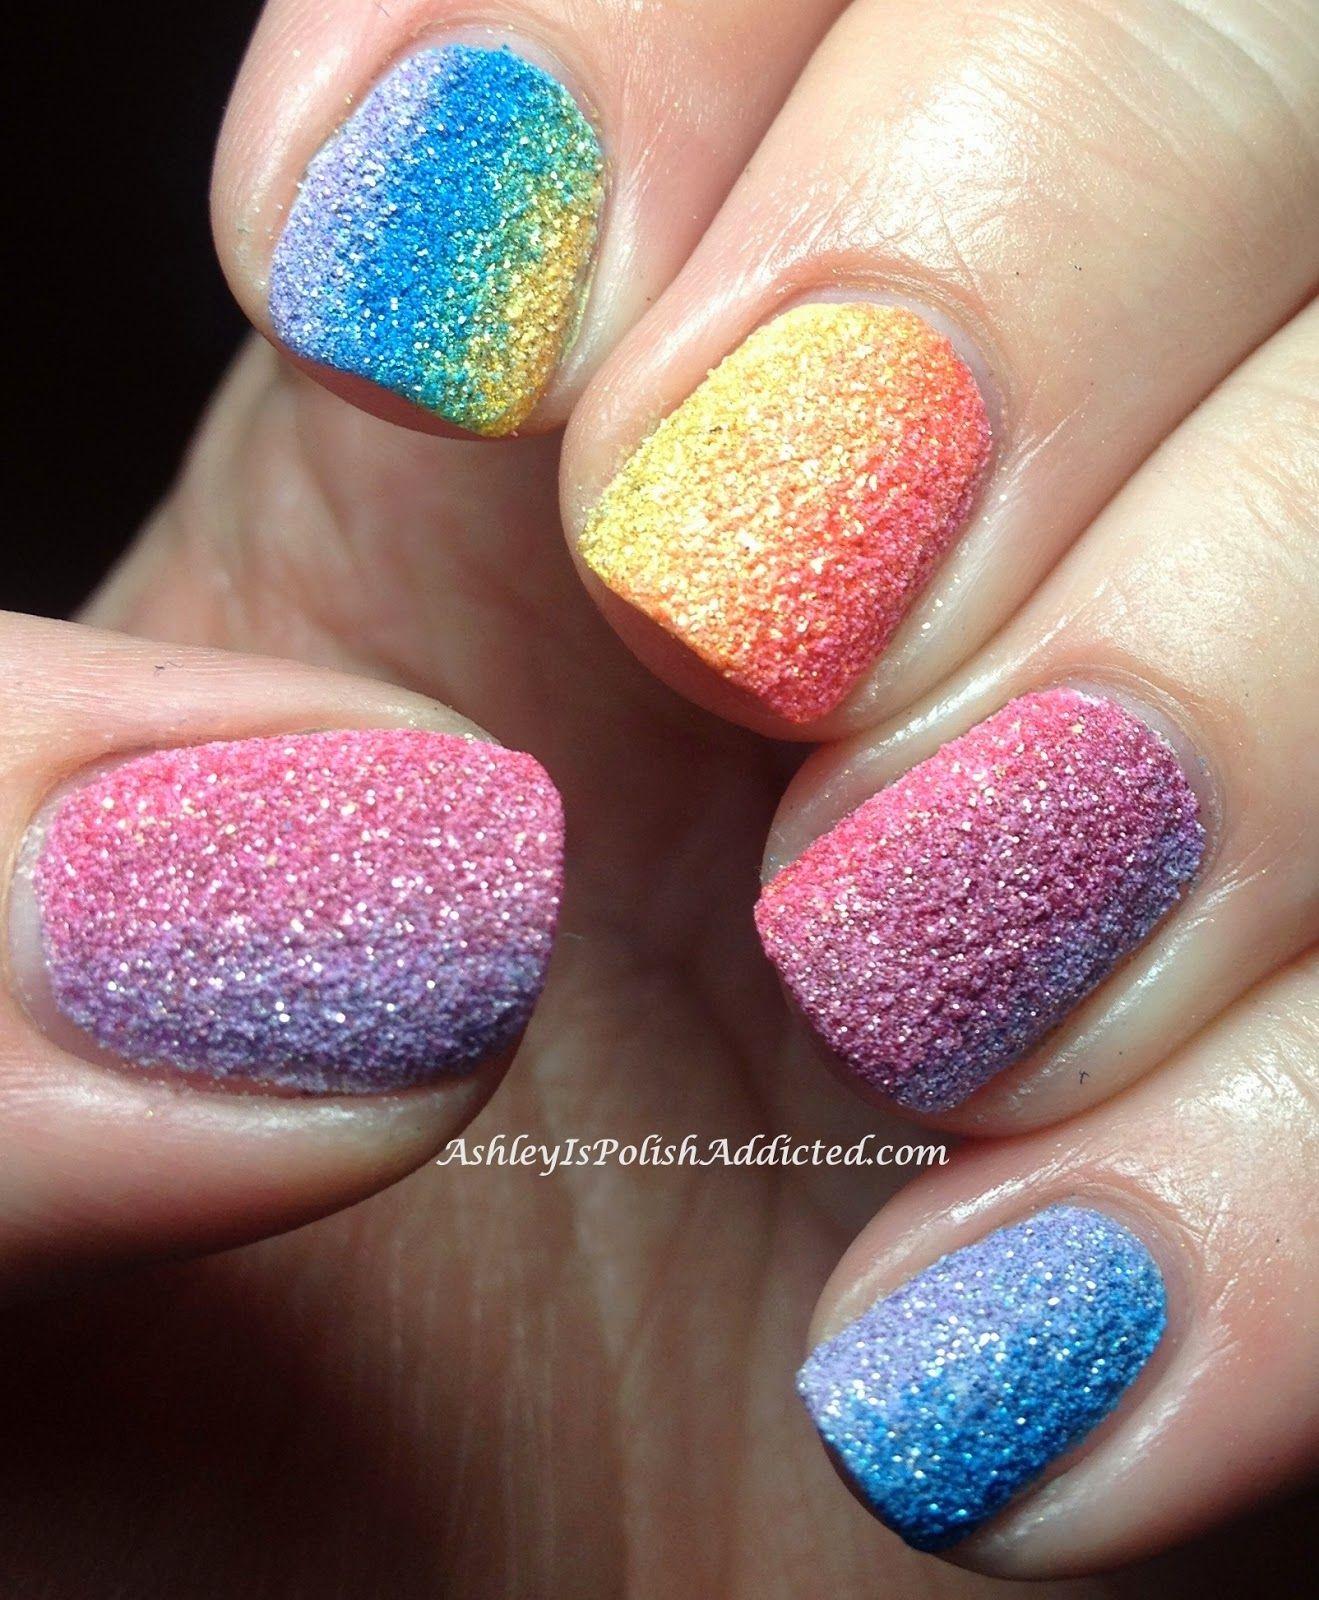 Piggieluv Rainbow Bubbles Nail Art: Ashley Is PolishAddicted: Zoya PixieDust Collection For